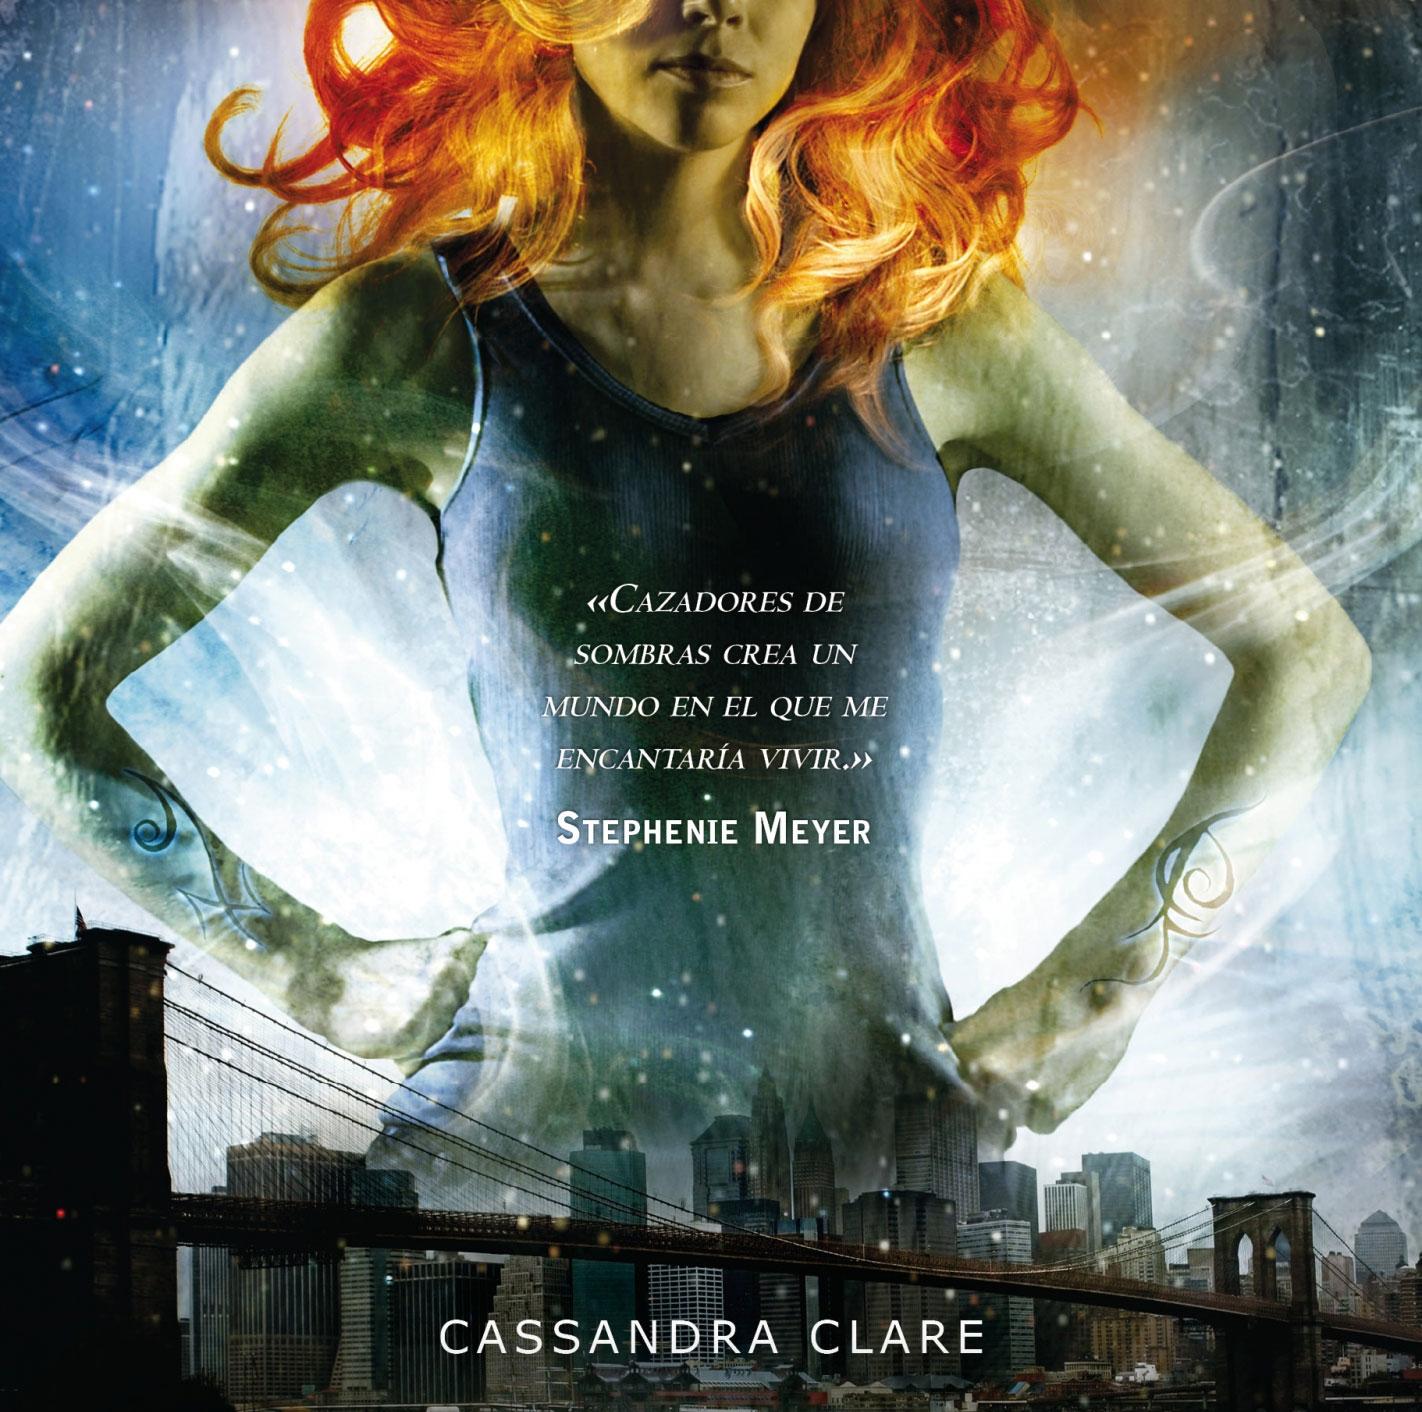 Cazadores_de_sombras-Cassandra_Clare